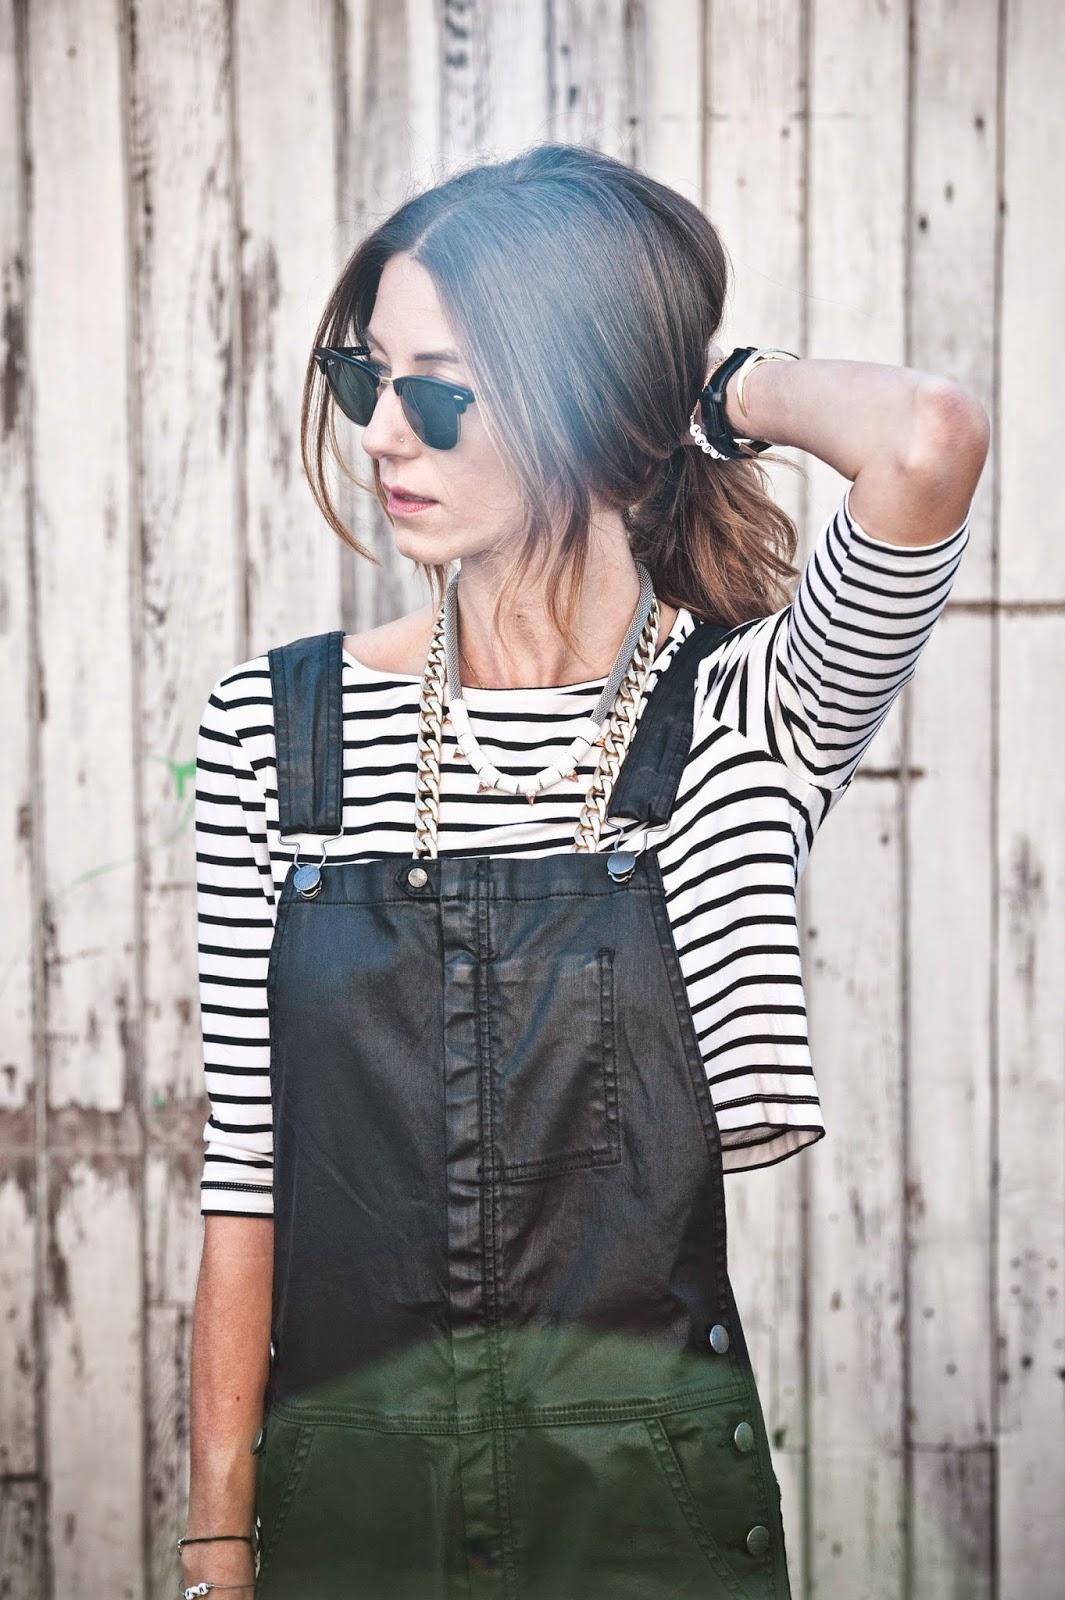 Overalls, Stripes, Tobruckave